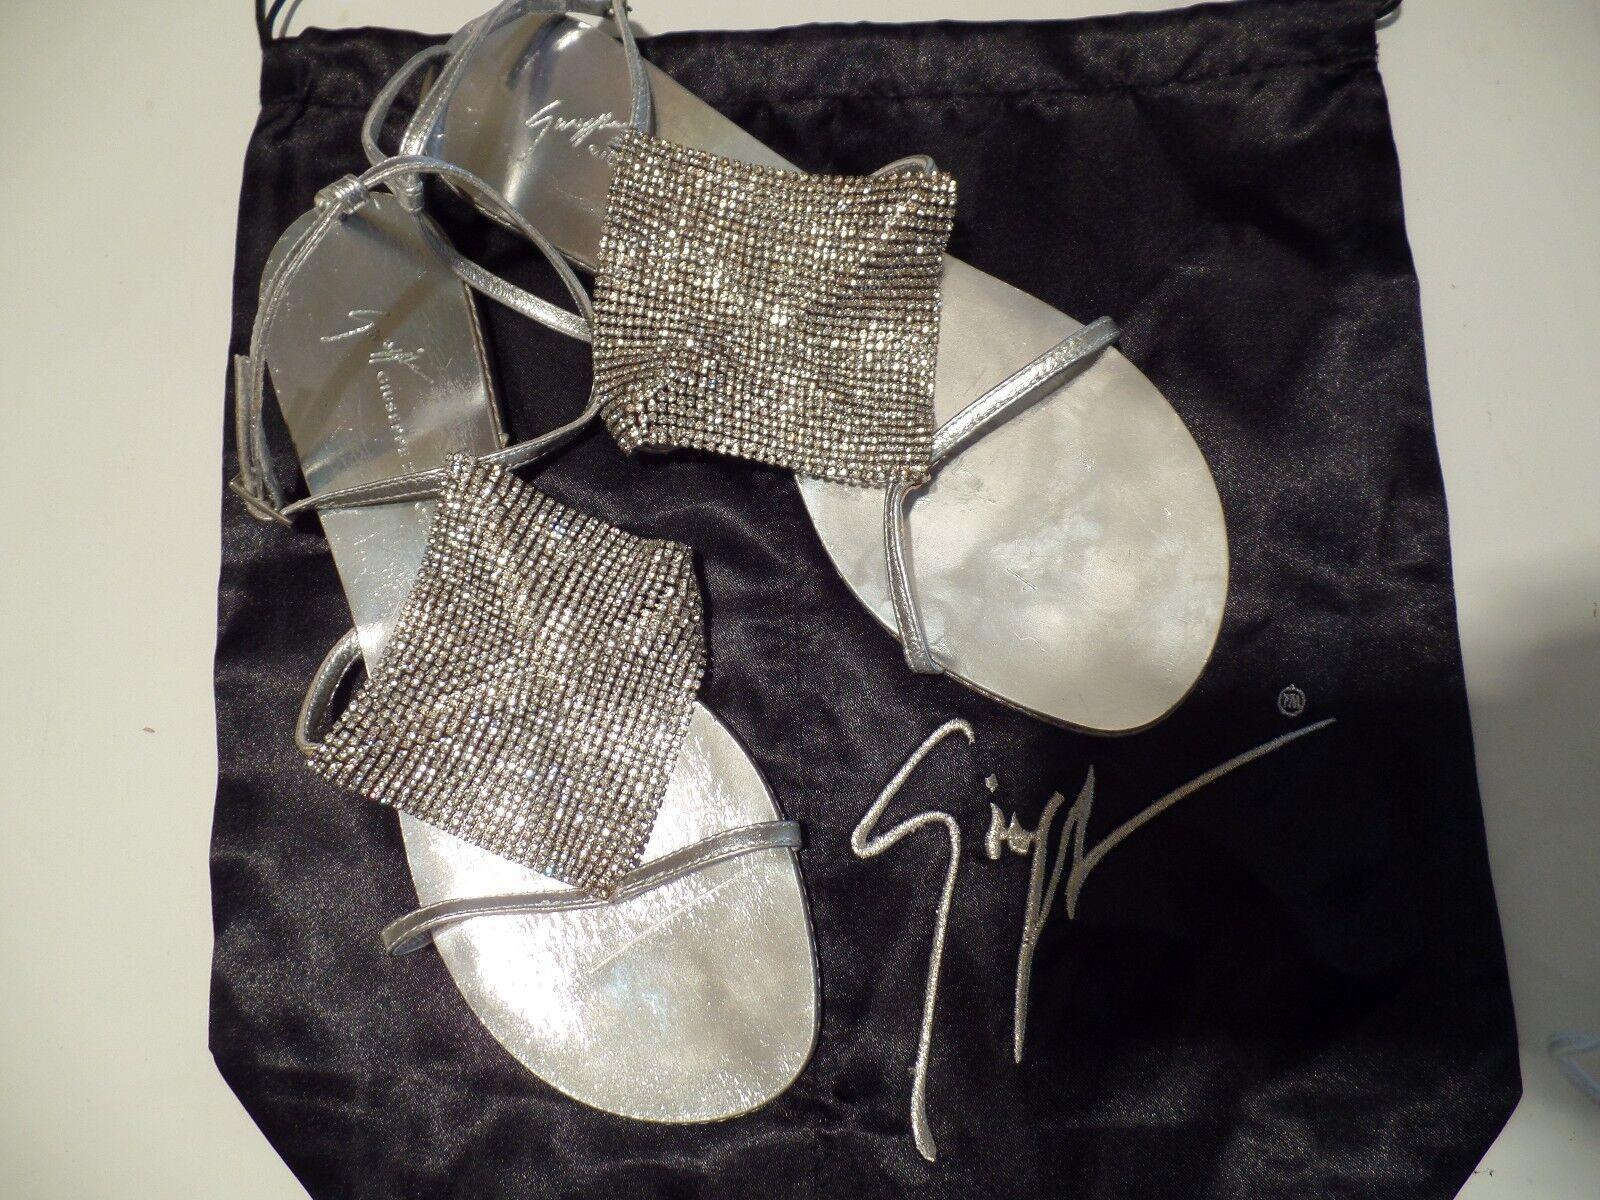 giuseppe zanotti métallique panneaux nwob cristal sandales en cuir métallique zanotti argentée 3b79ee